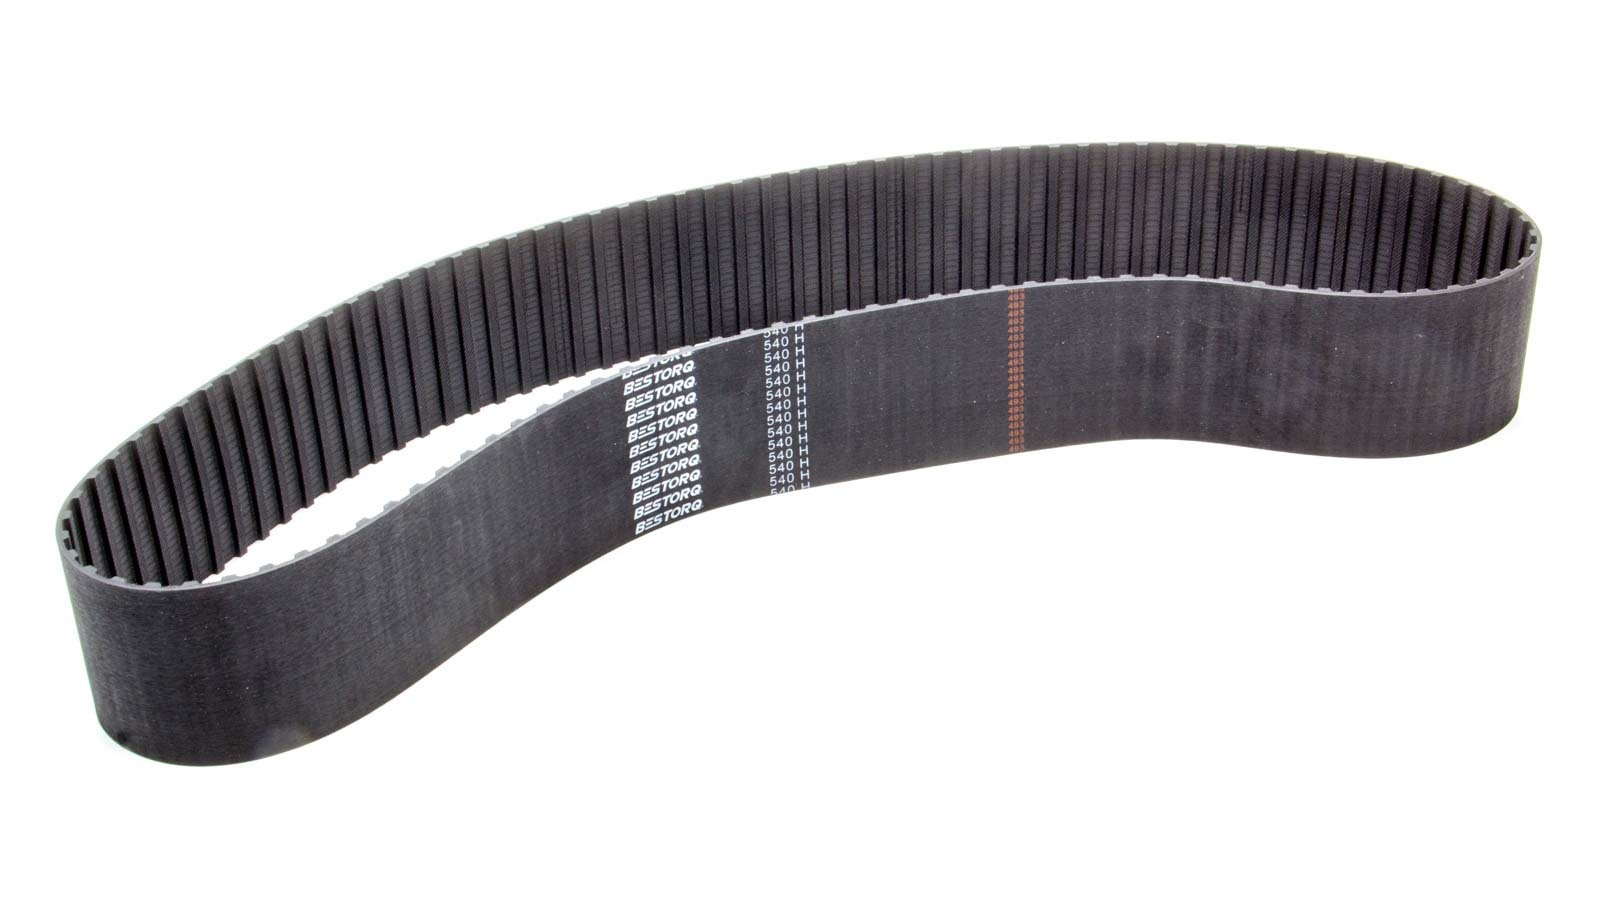 Blower Drive Service Blower Belt - 117T 58.5 x 3 - 1/2 Pitch